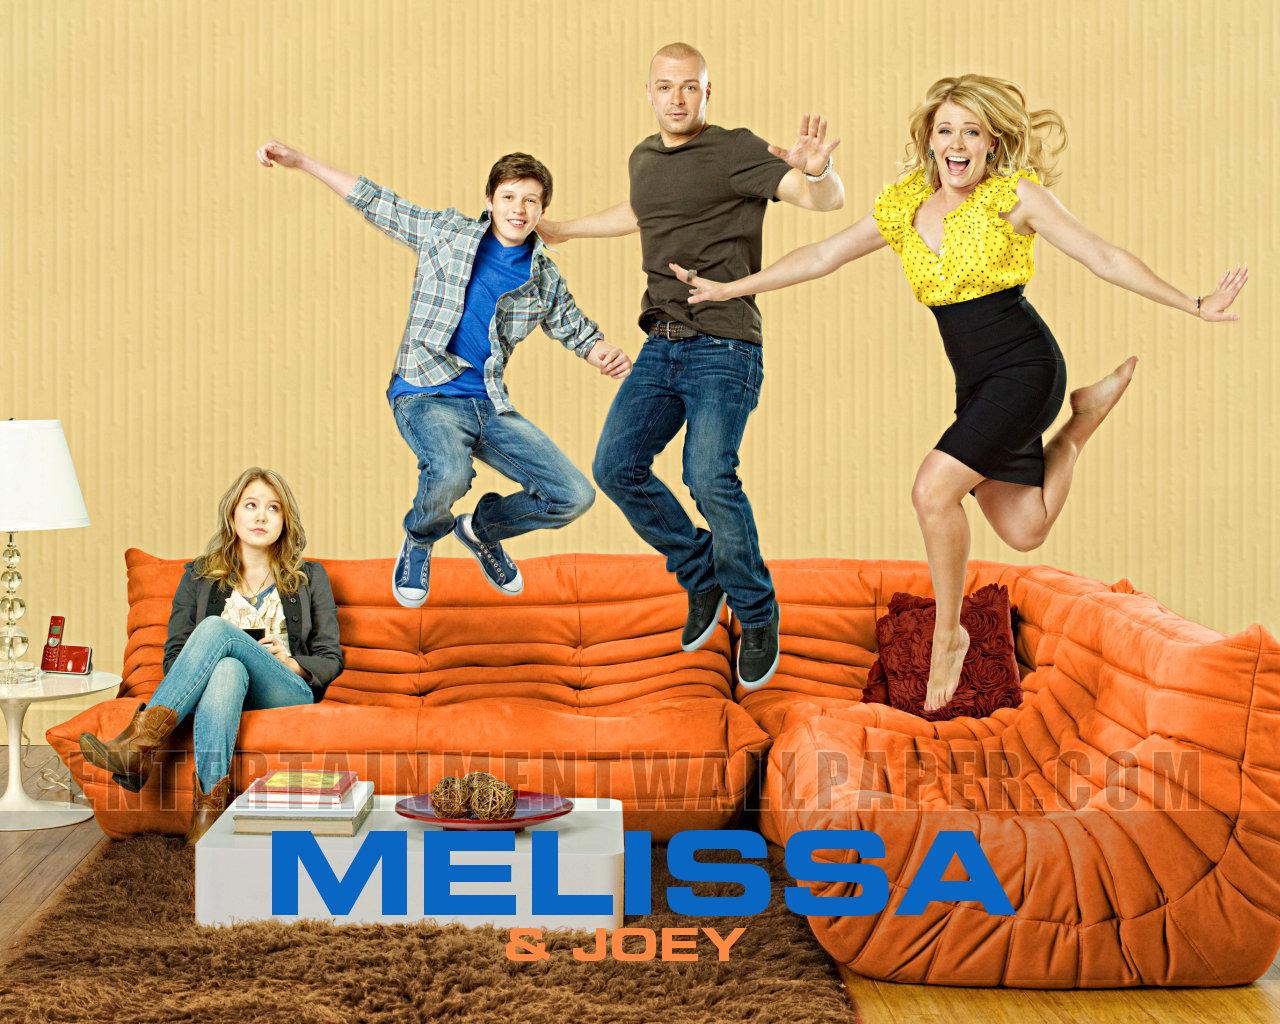 Capa Melissa & Joey S03E29 Legenda Torrent AVI Assistir Online  MAJ melissa and joey 30503341 1280 1024